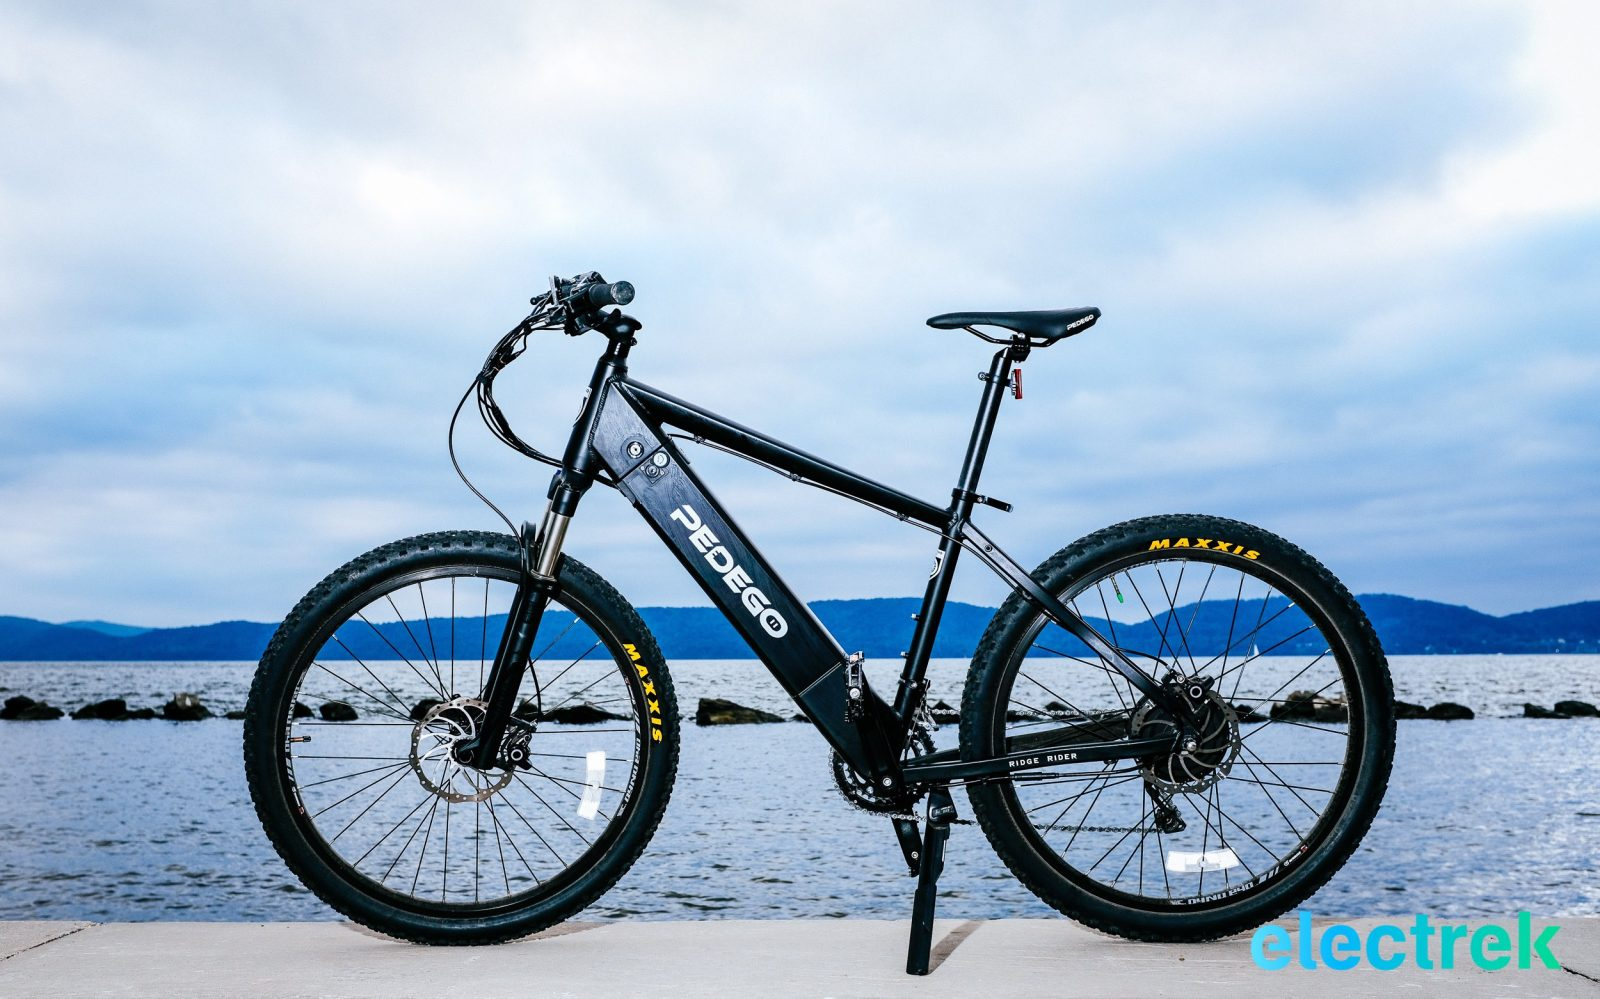 7fa9bd56154 The Electrek Review: the Pedego Ridge Rider, a hardtail electric mountain  bike